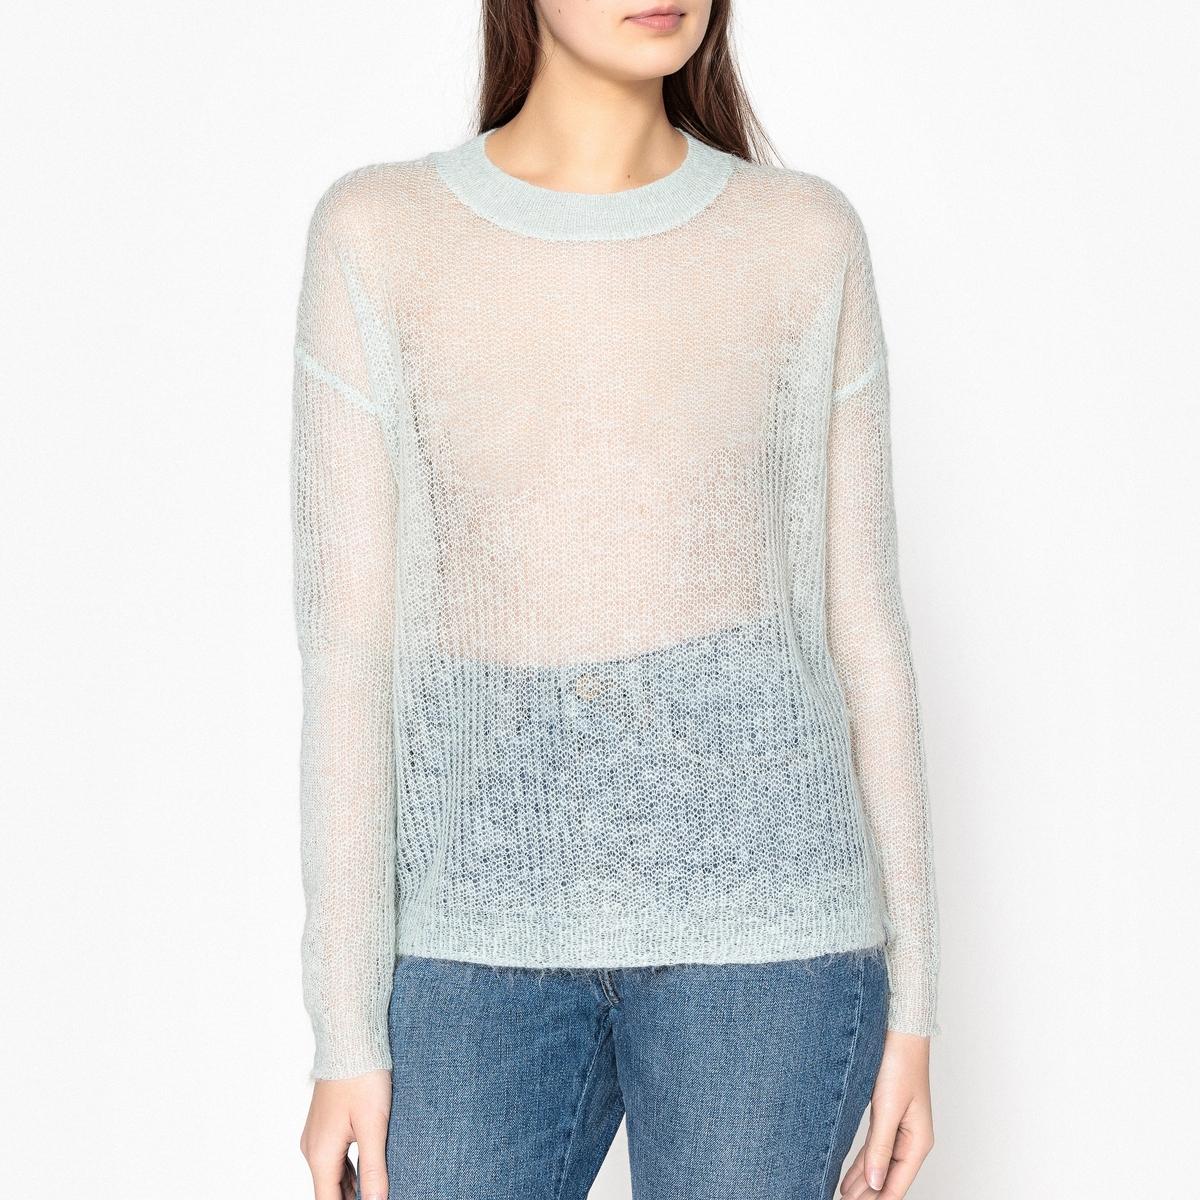 Пуловер из трикотажа с пуговицами по бокам